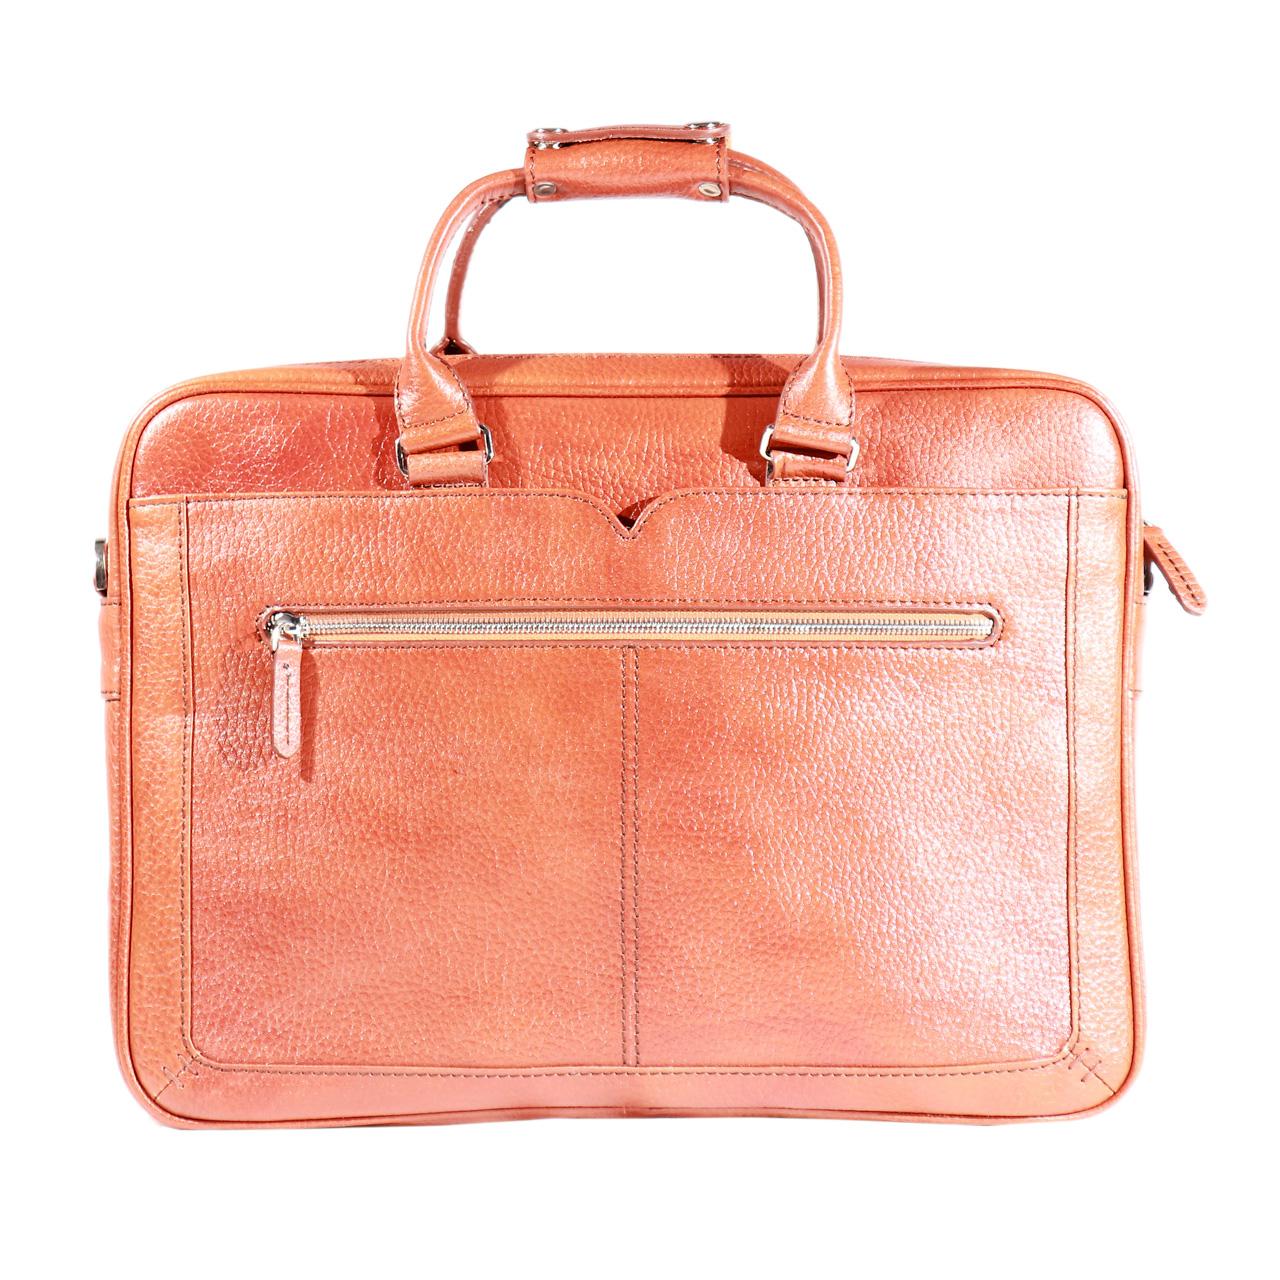 کیف چرم طبیعی دیاموند مدل L8394